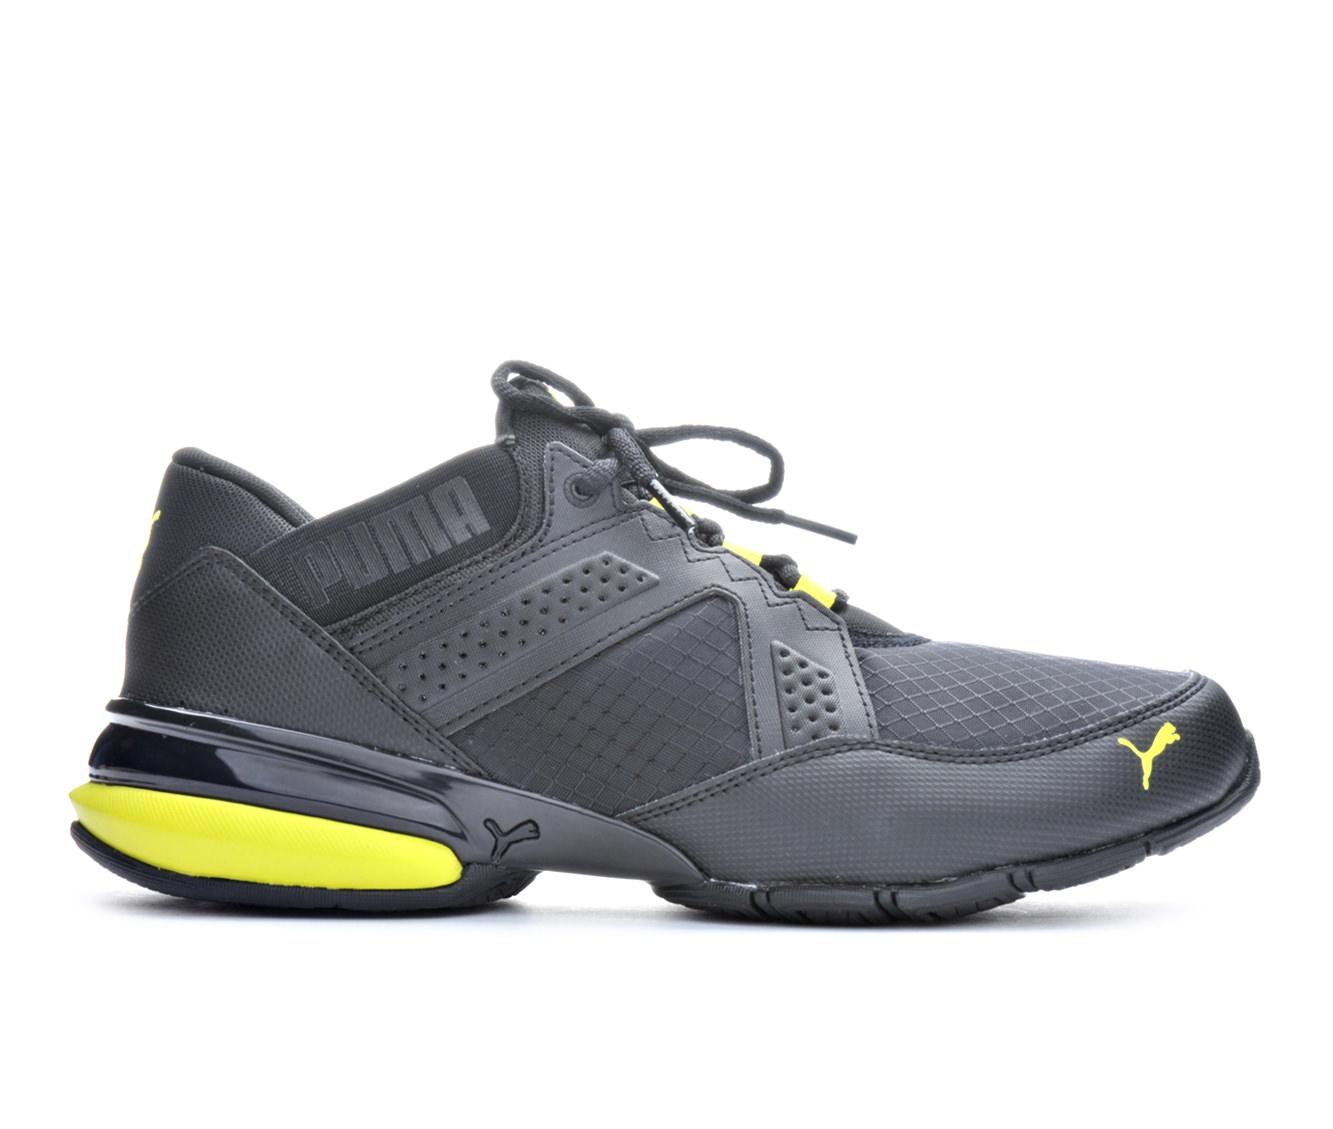 Men's Puma Enzin Ripstop Running Shoes (Black - Size 14) 1661289